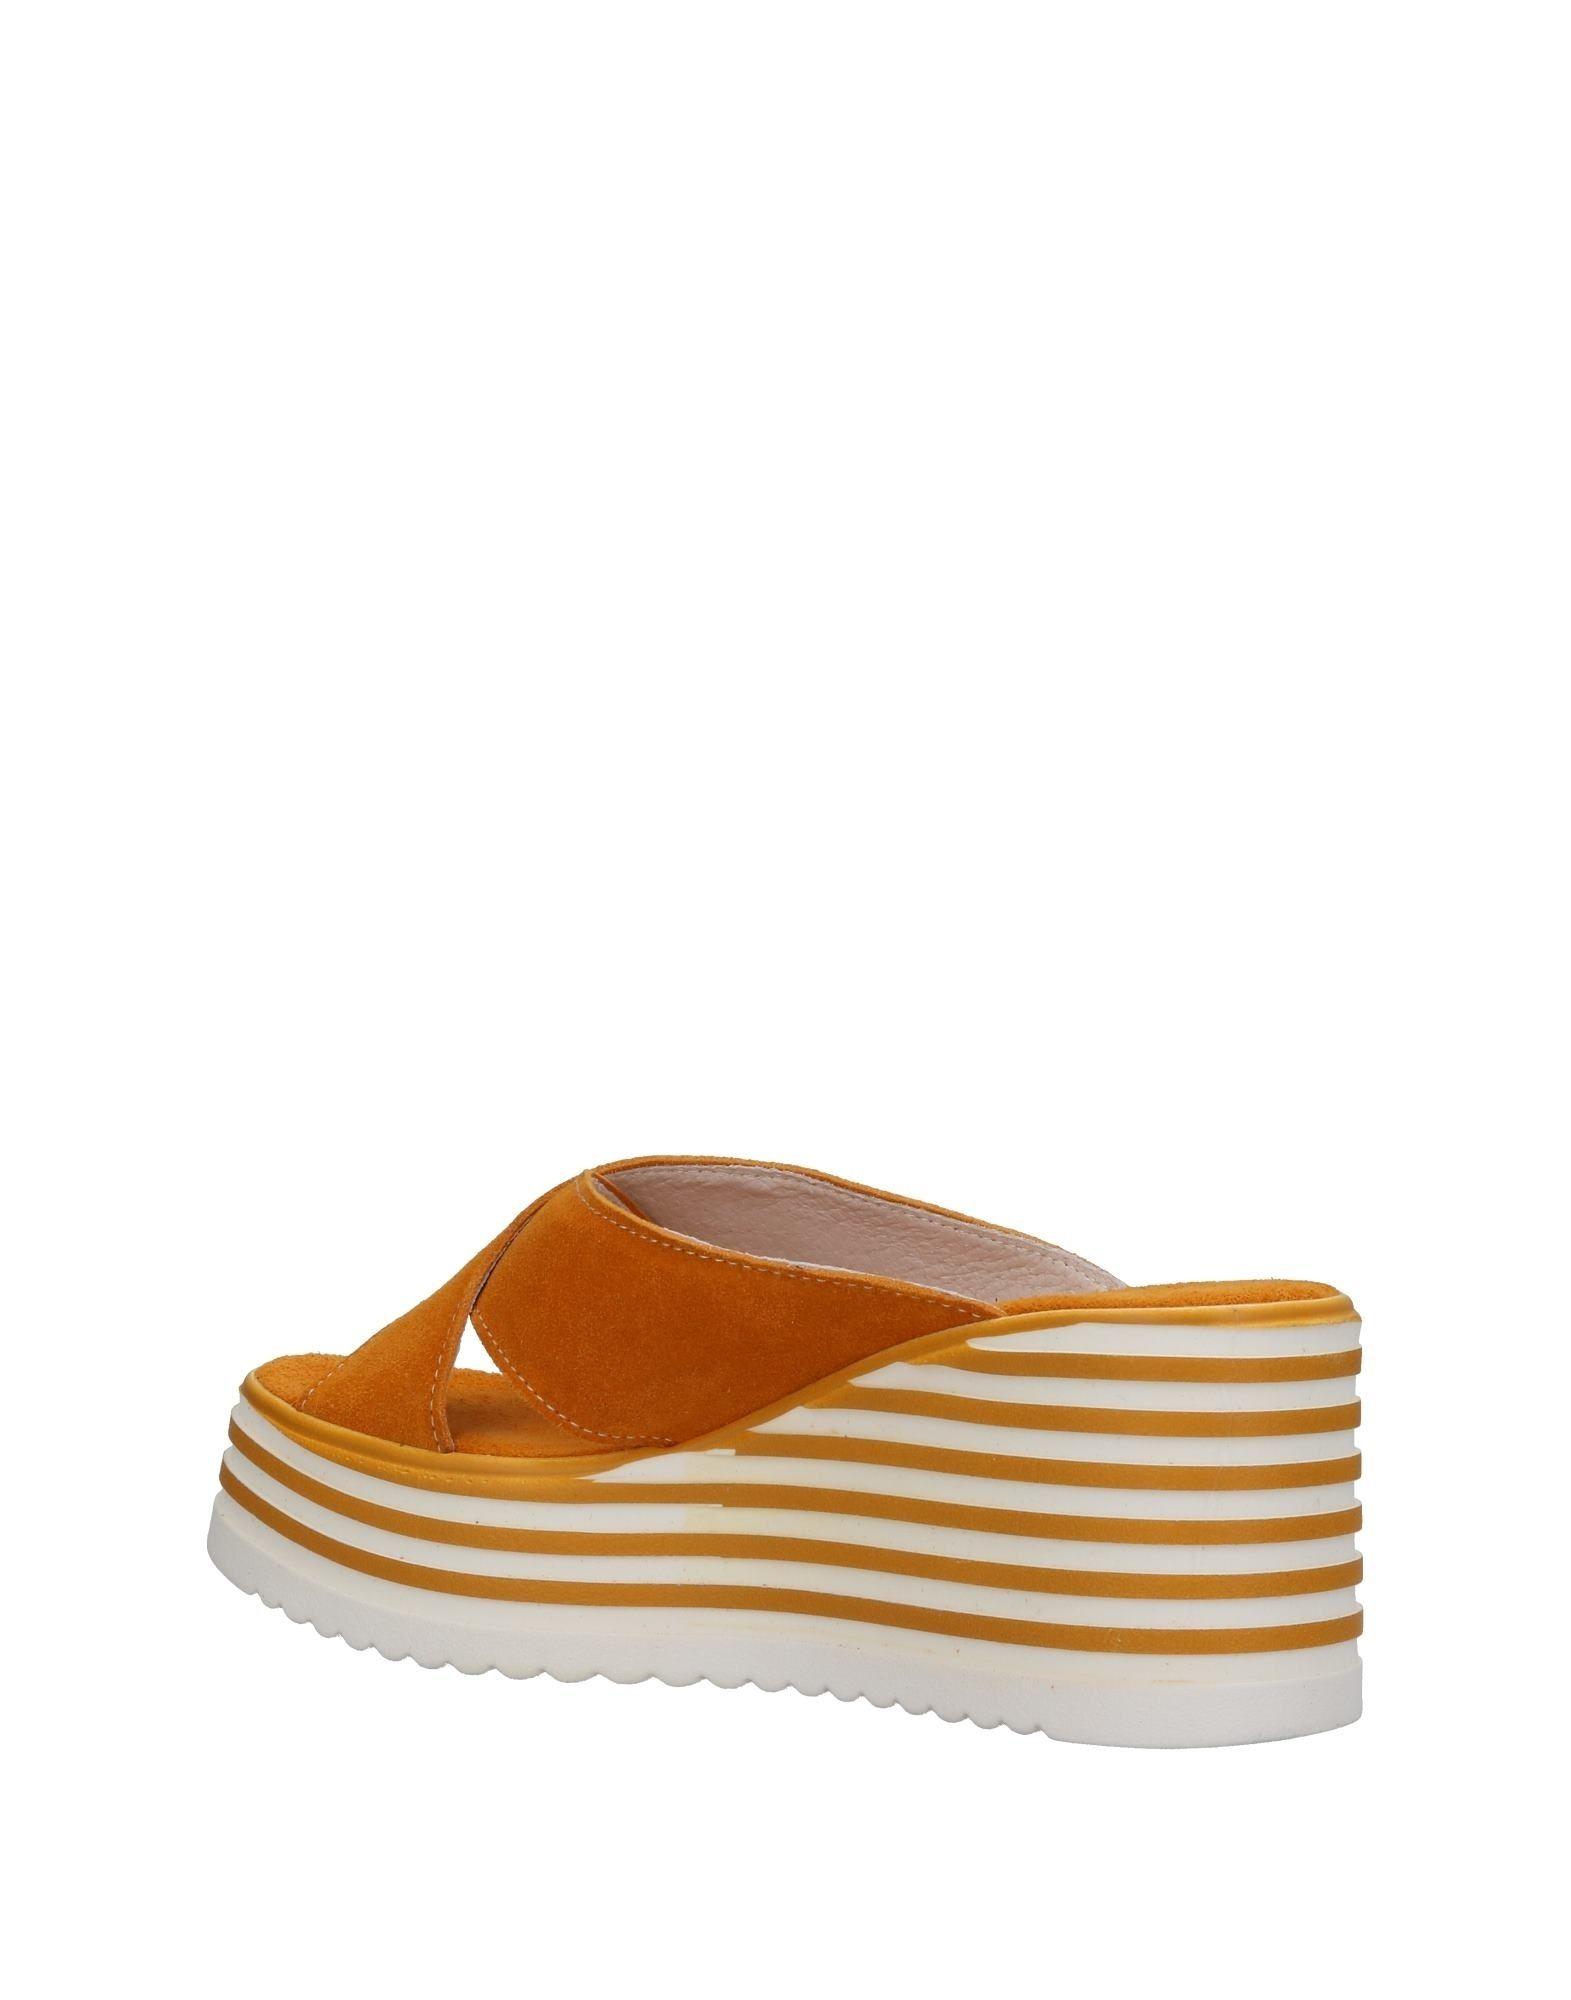 Unlace Sandalen Damen  11375488PX Gute Qualität beliebte Schuhe